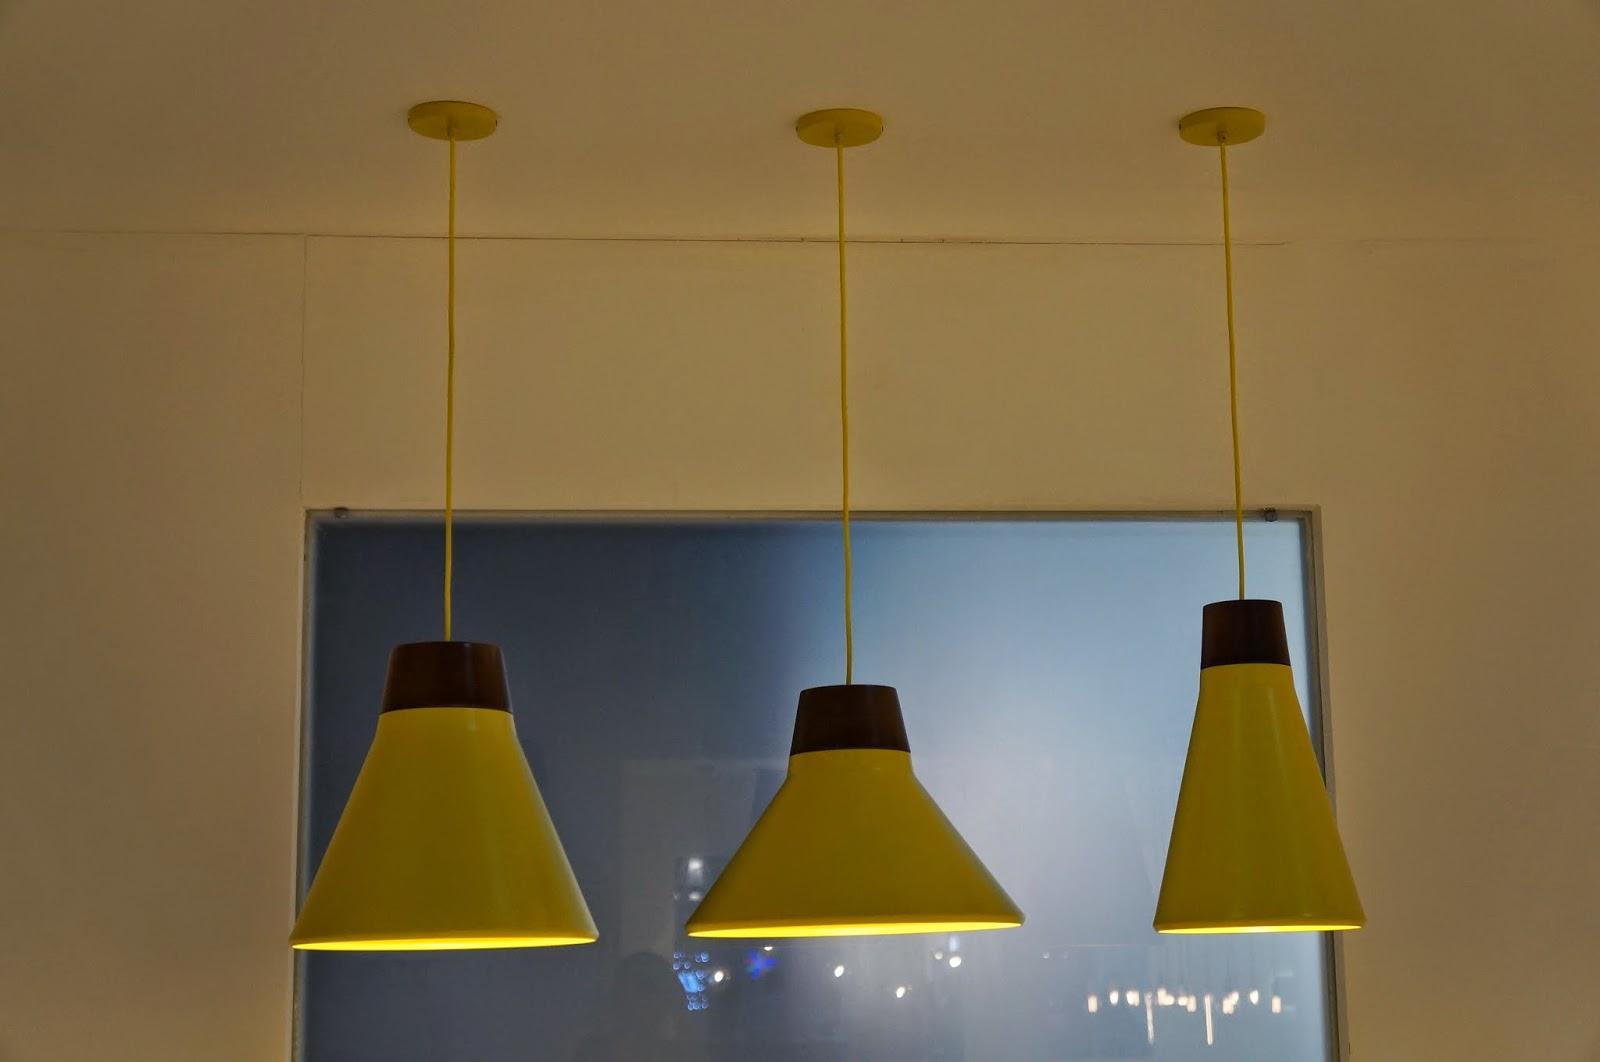 trio de pendentes amarelos - Dimlux - Expolux 2014